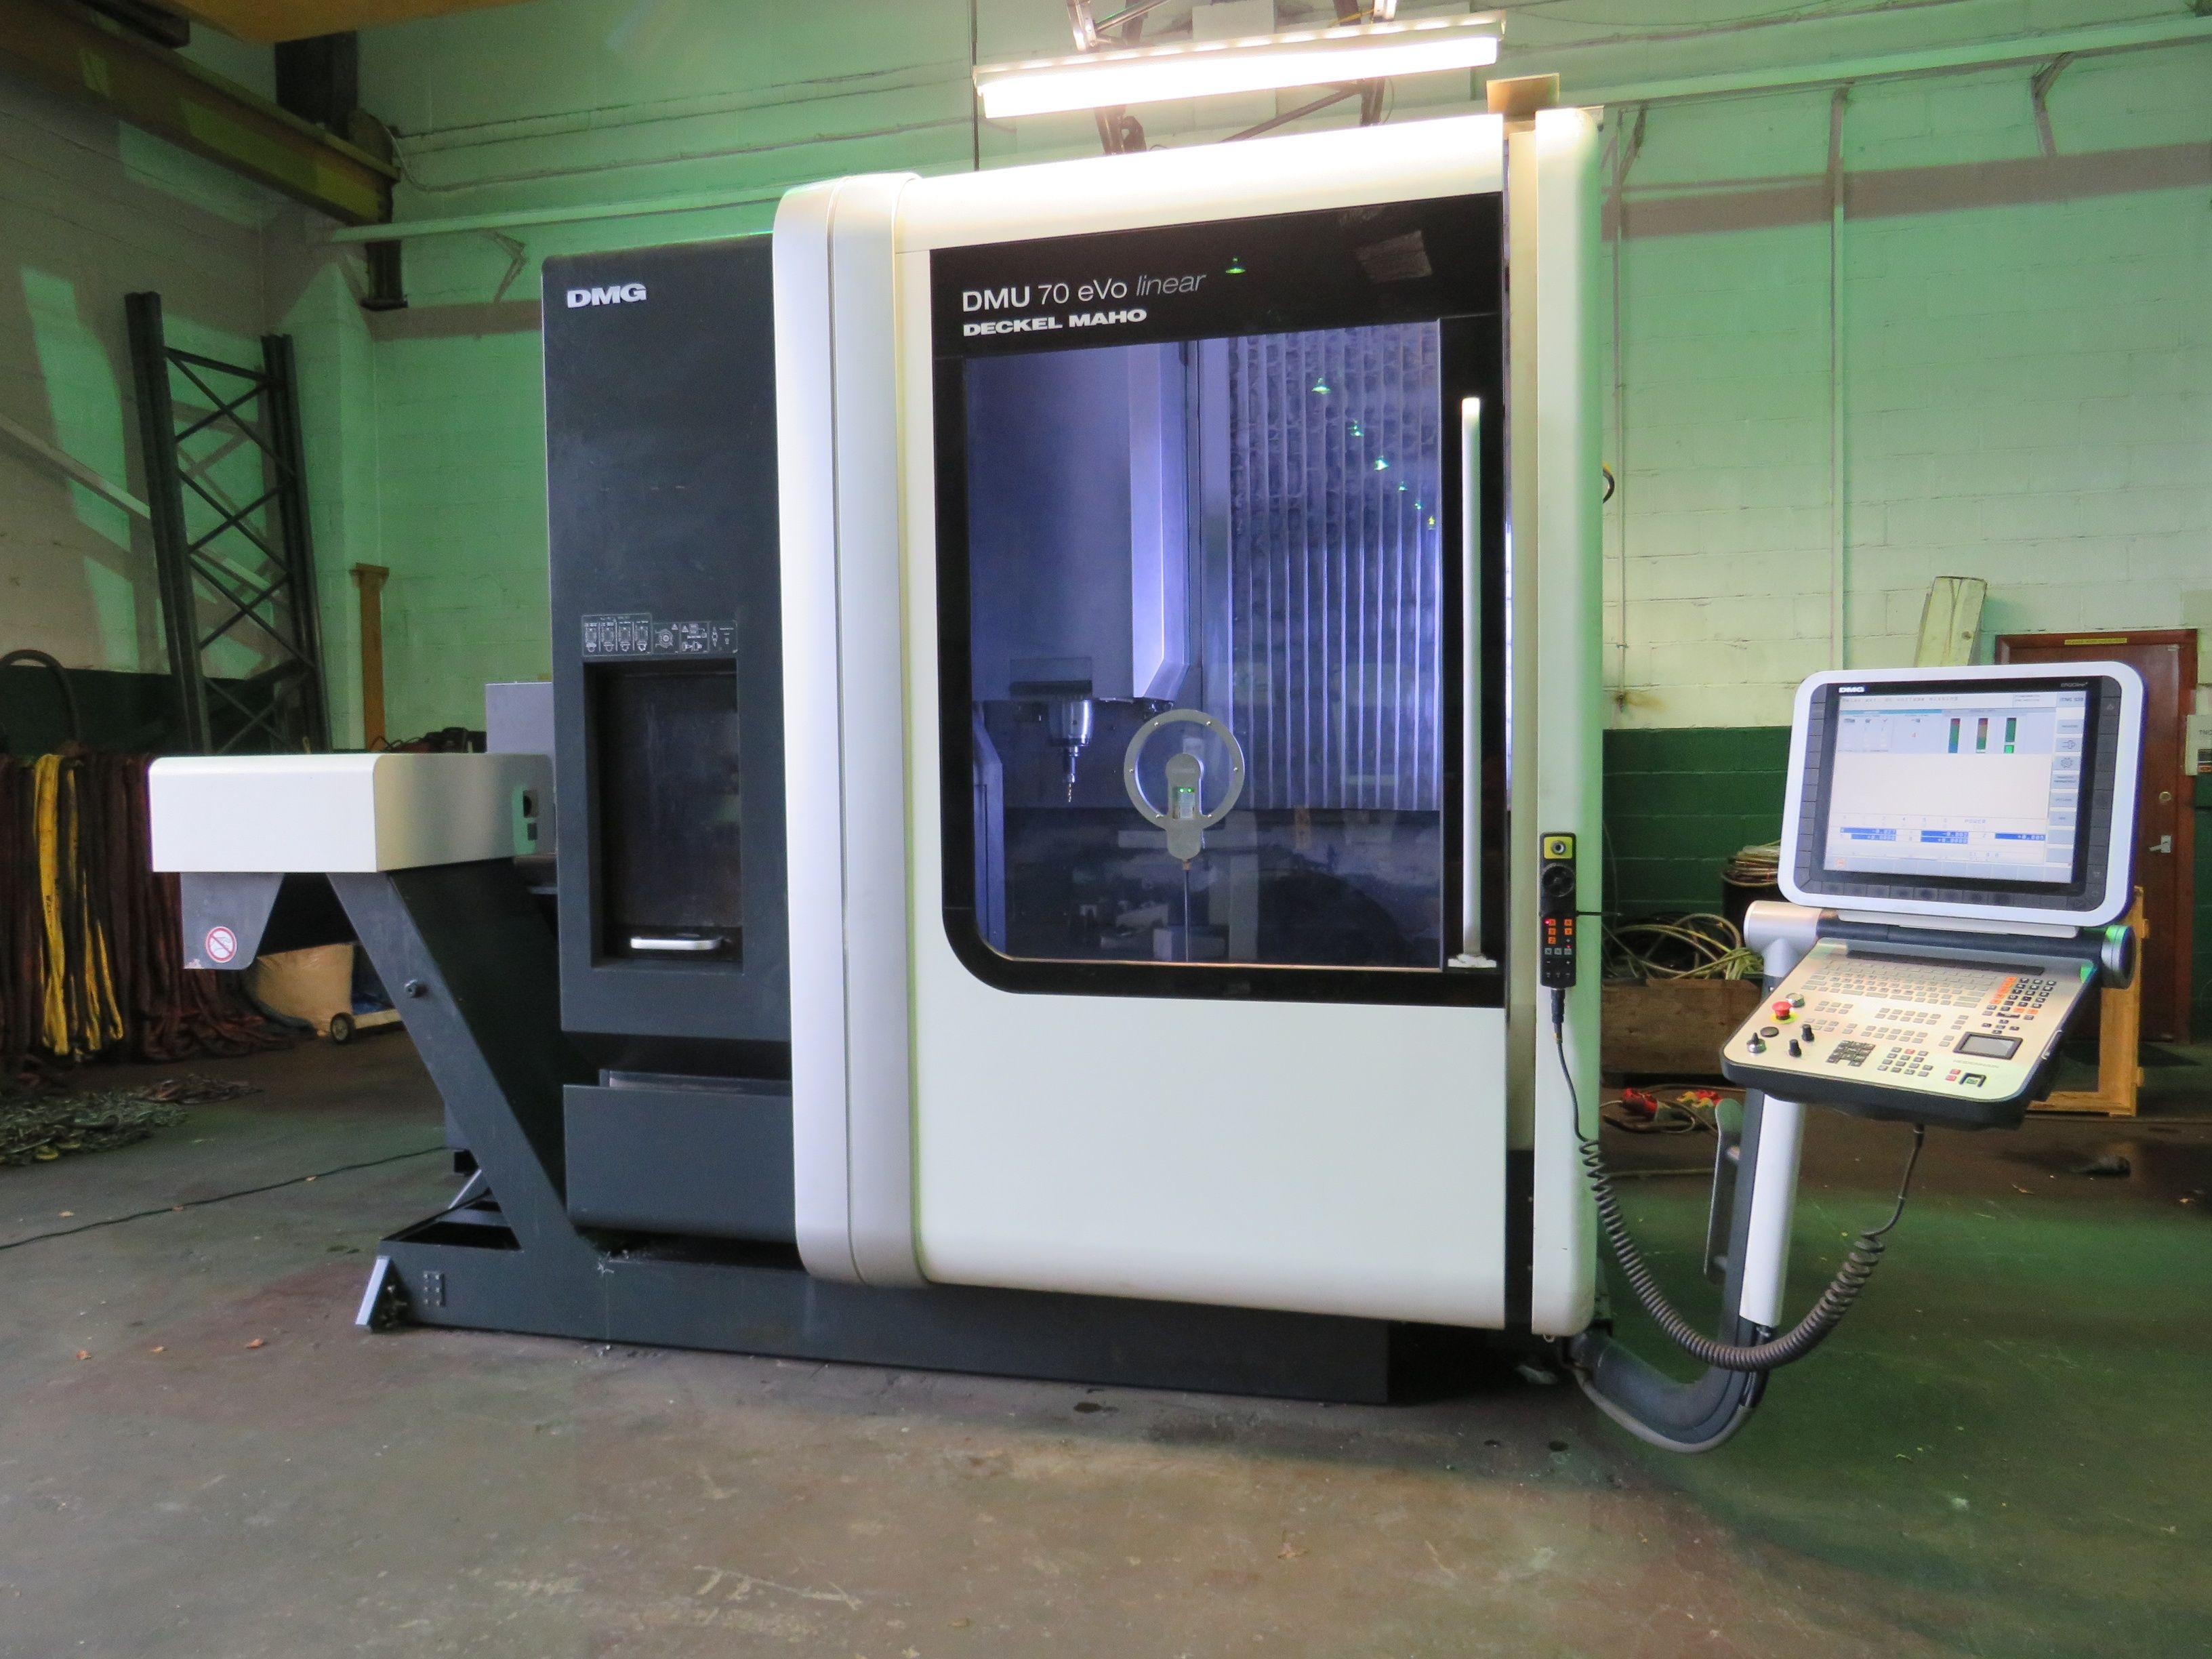 Deckel Maho DMU 70 EVO Lineares 5-Achsen-Bearbeitungszentrum